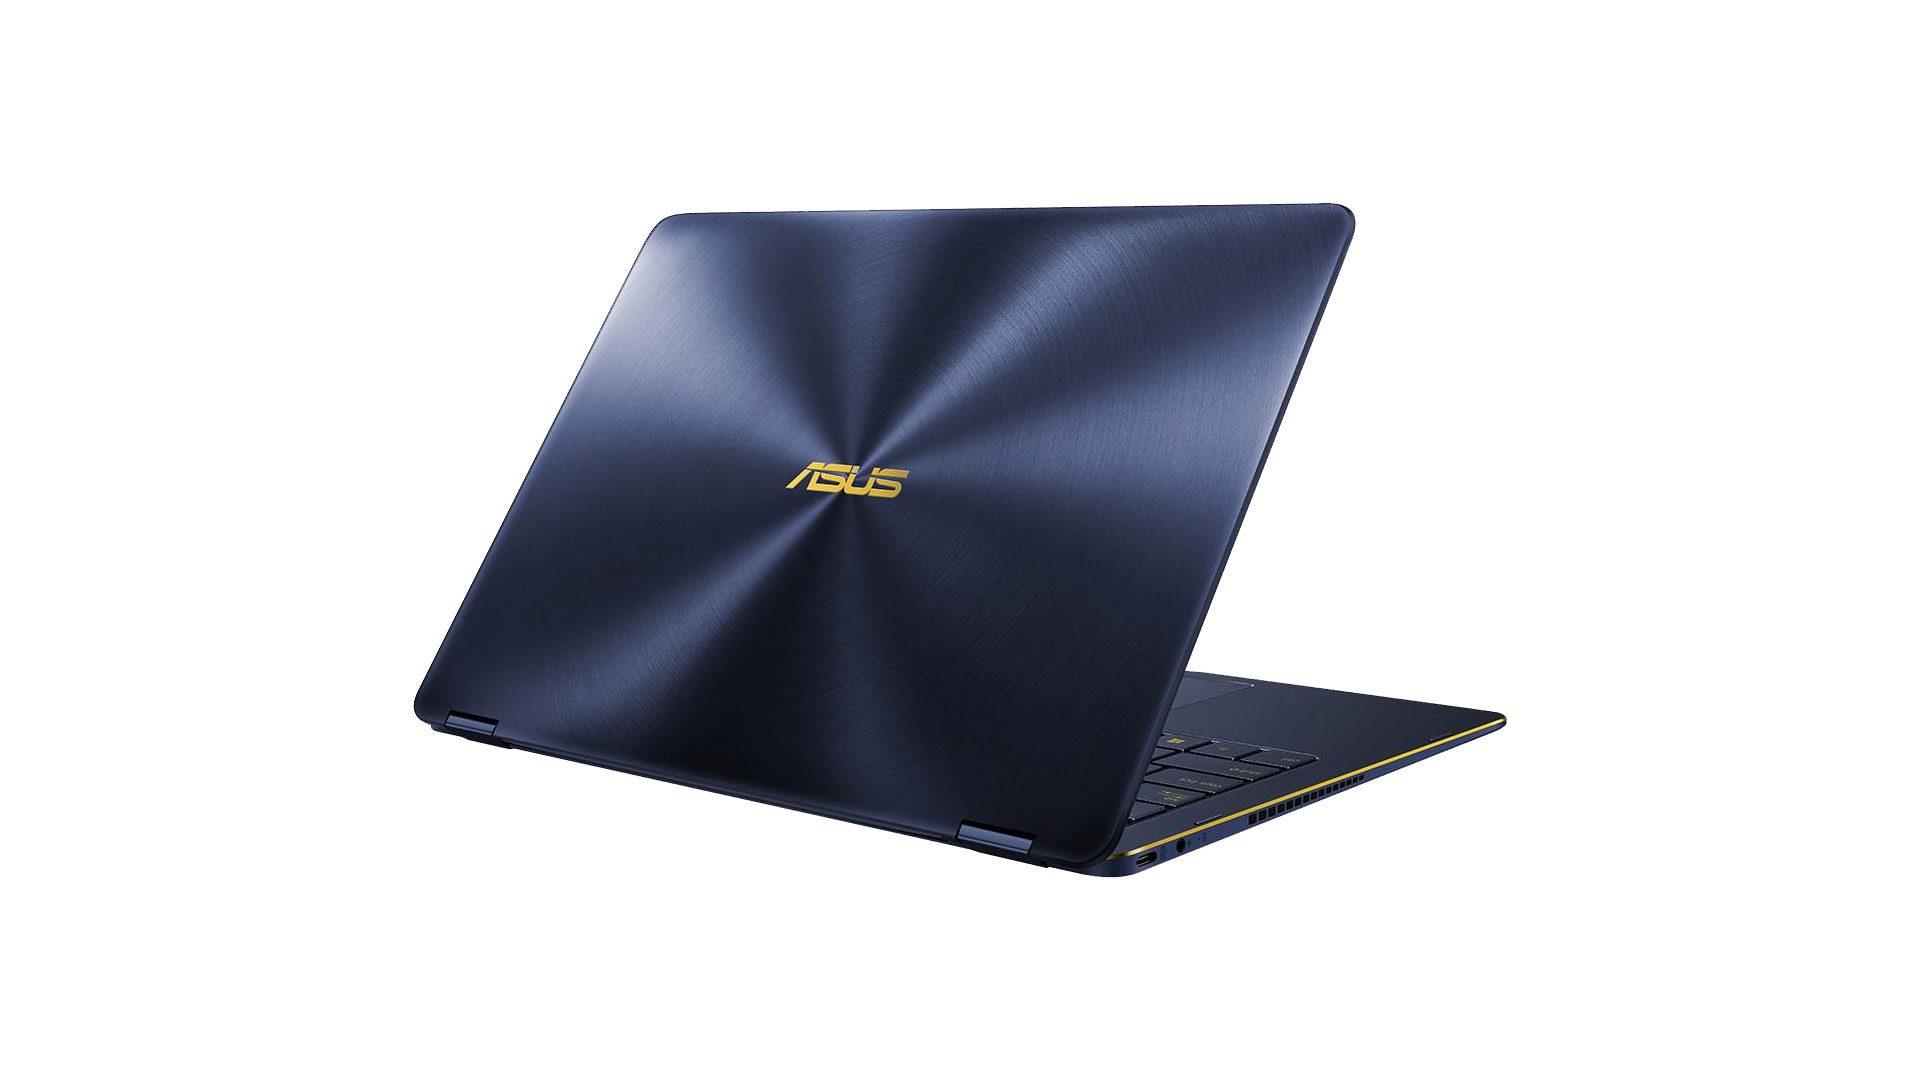 Asus-Zenbook-Flip-S-UX370_Ansicht-8